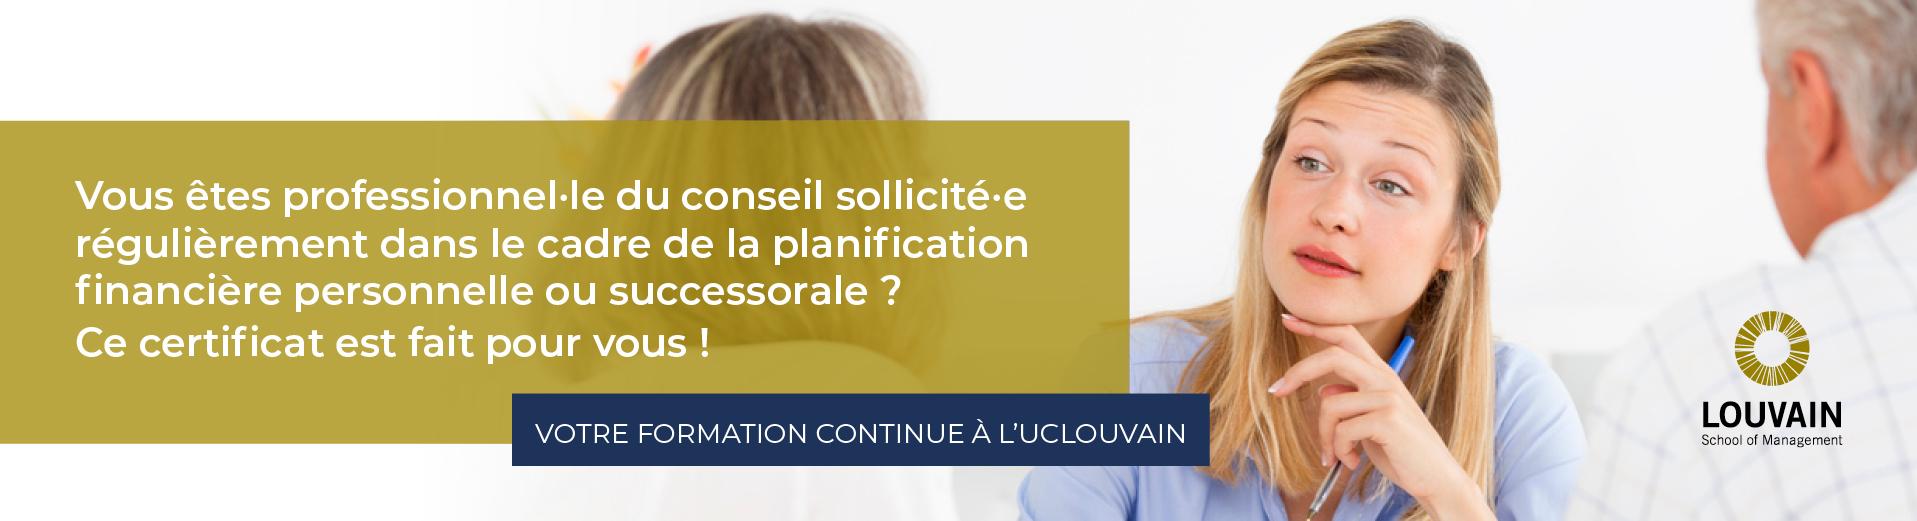 PlanificationPatrimoniale_Header_Homepage.jpg